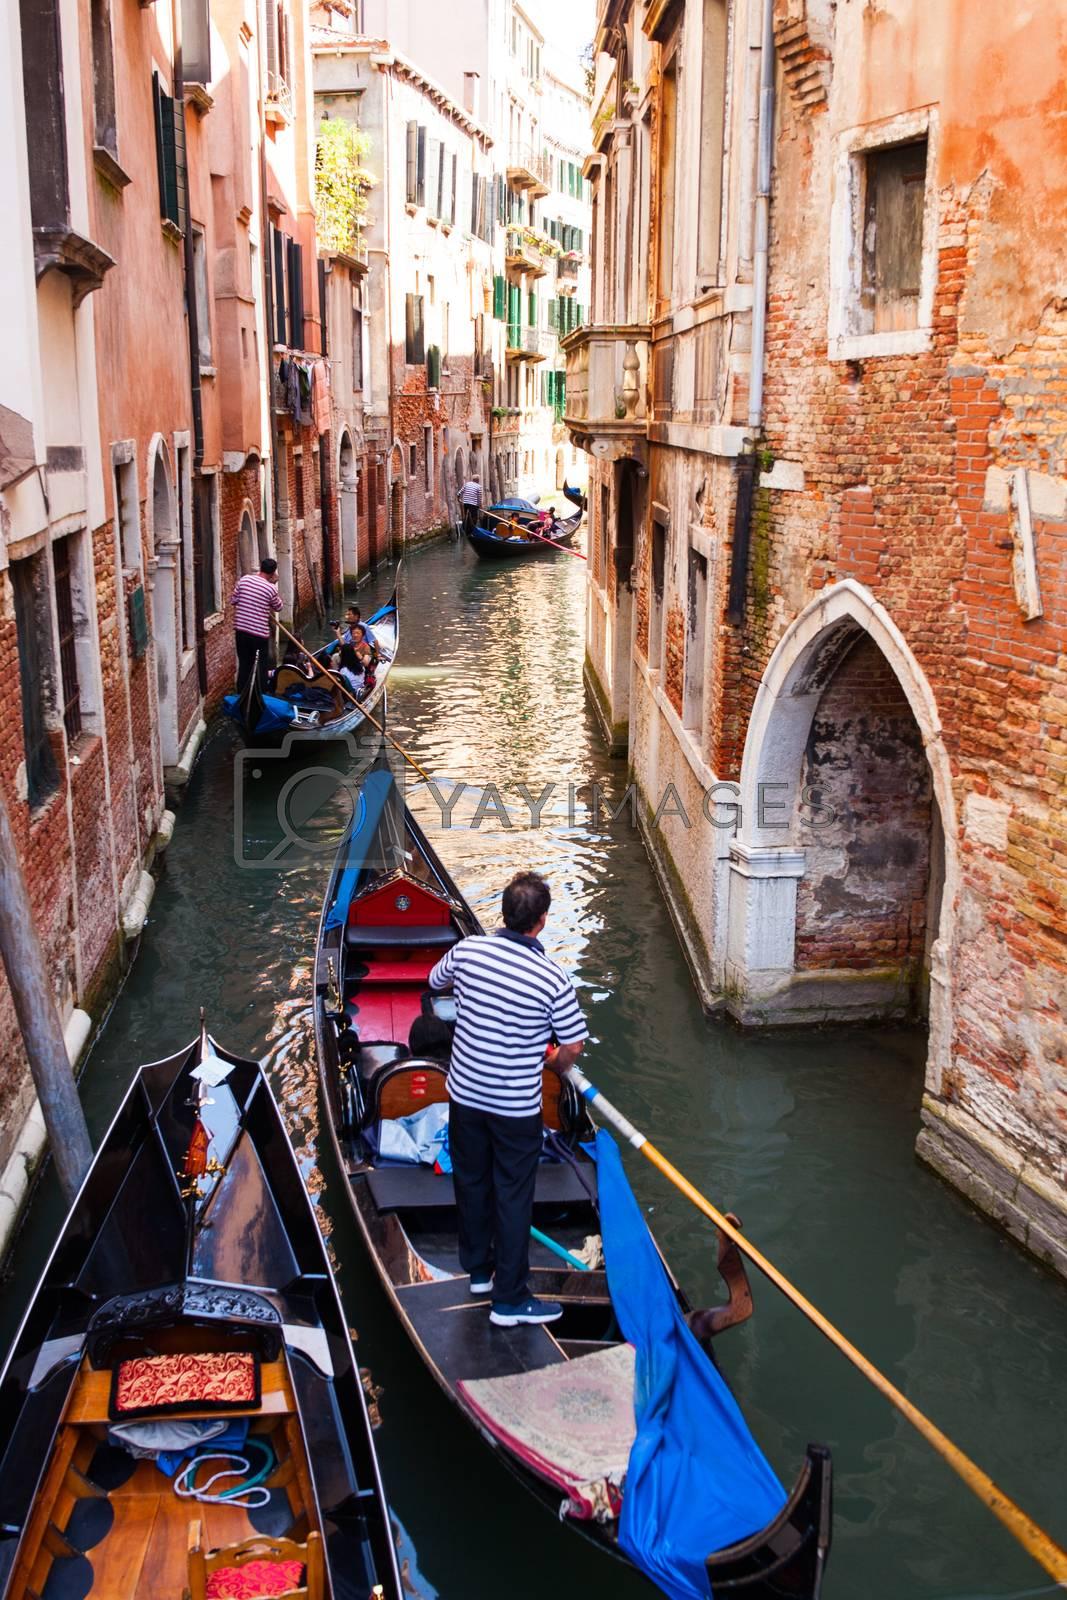 Gondolier in Venice by bepsimage